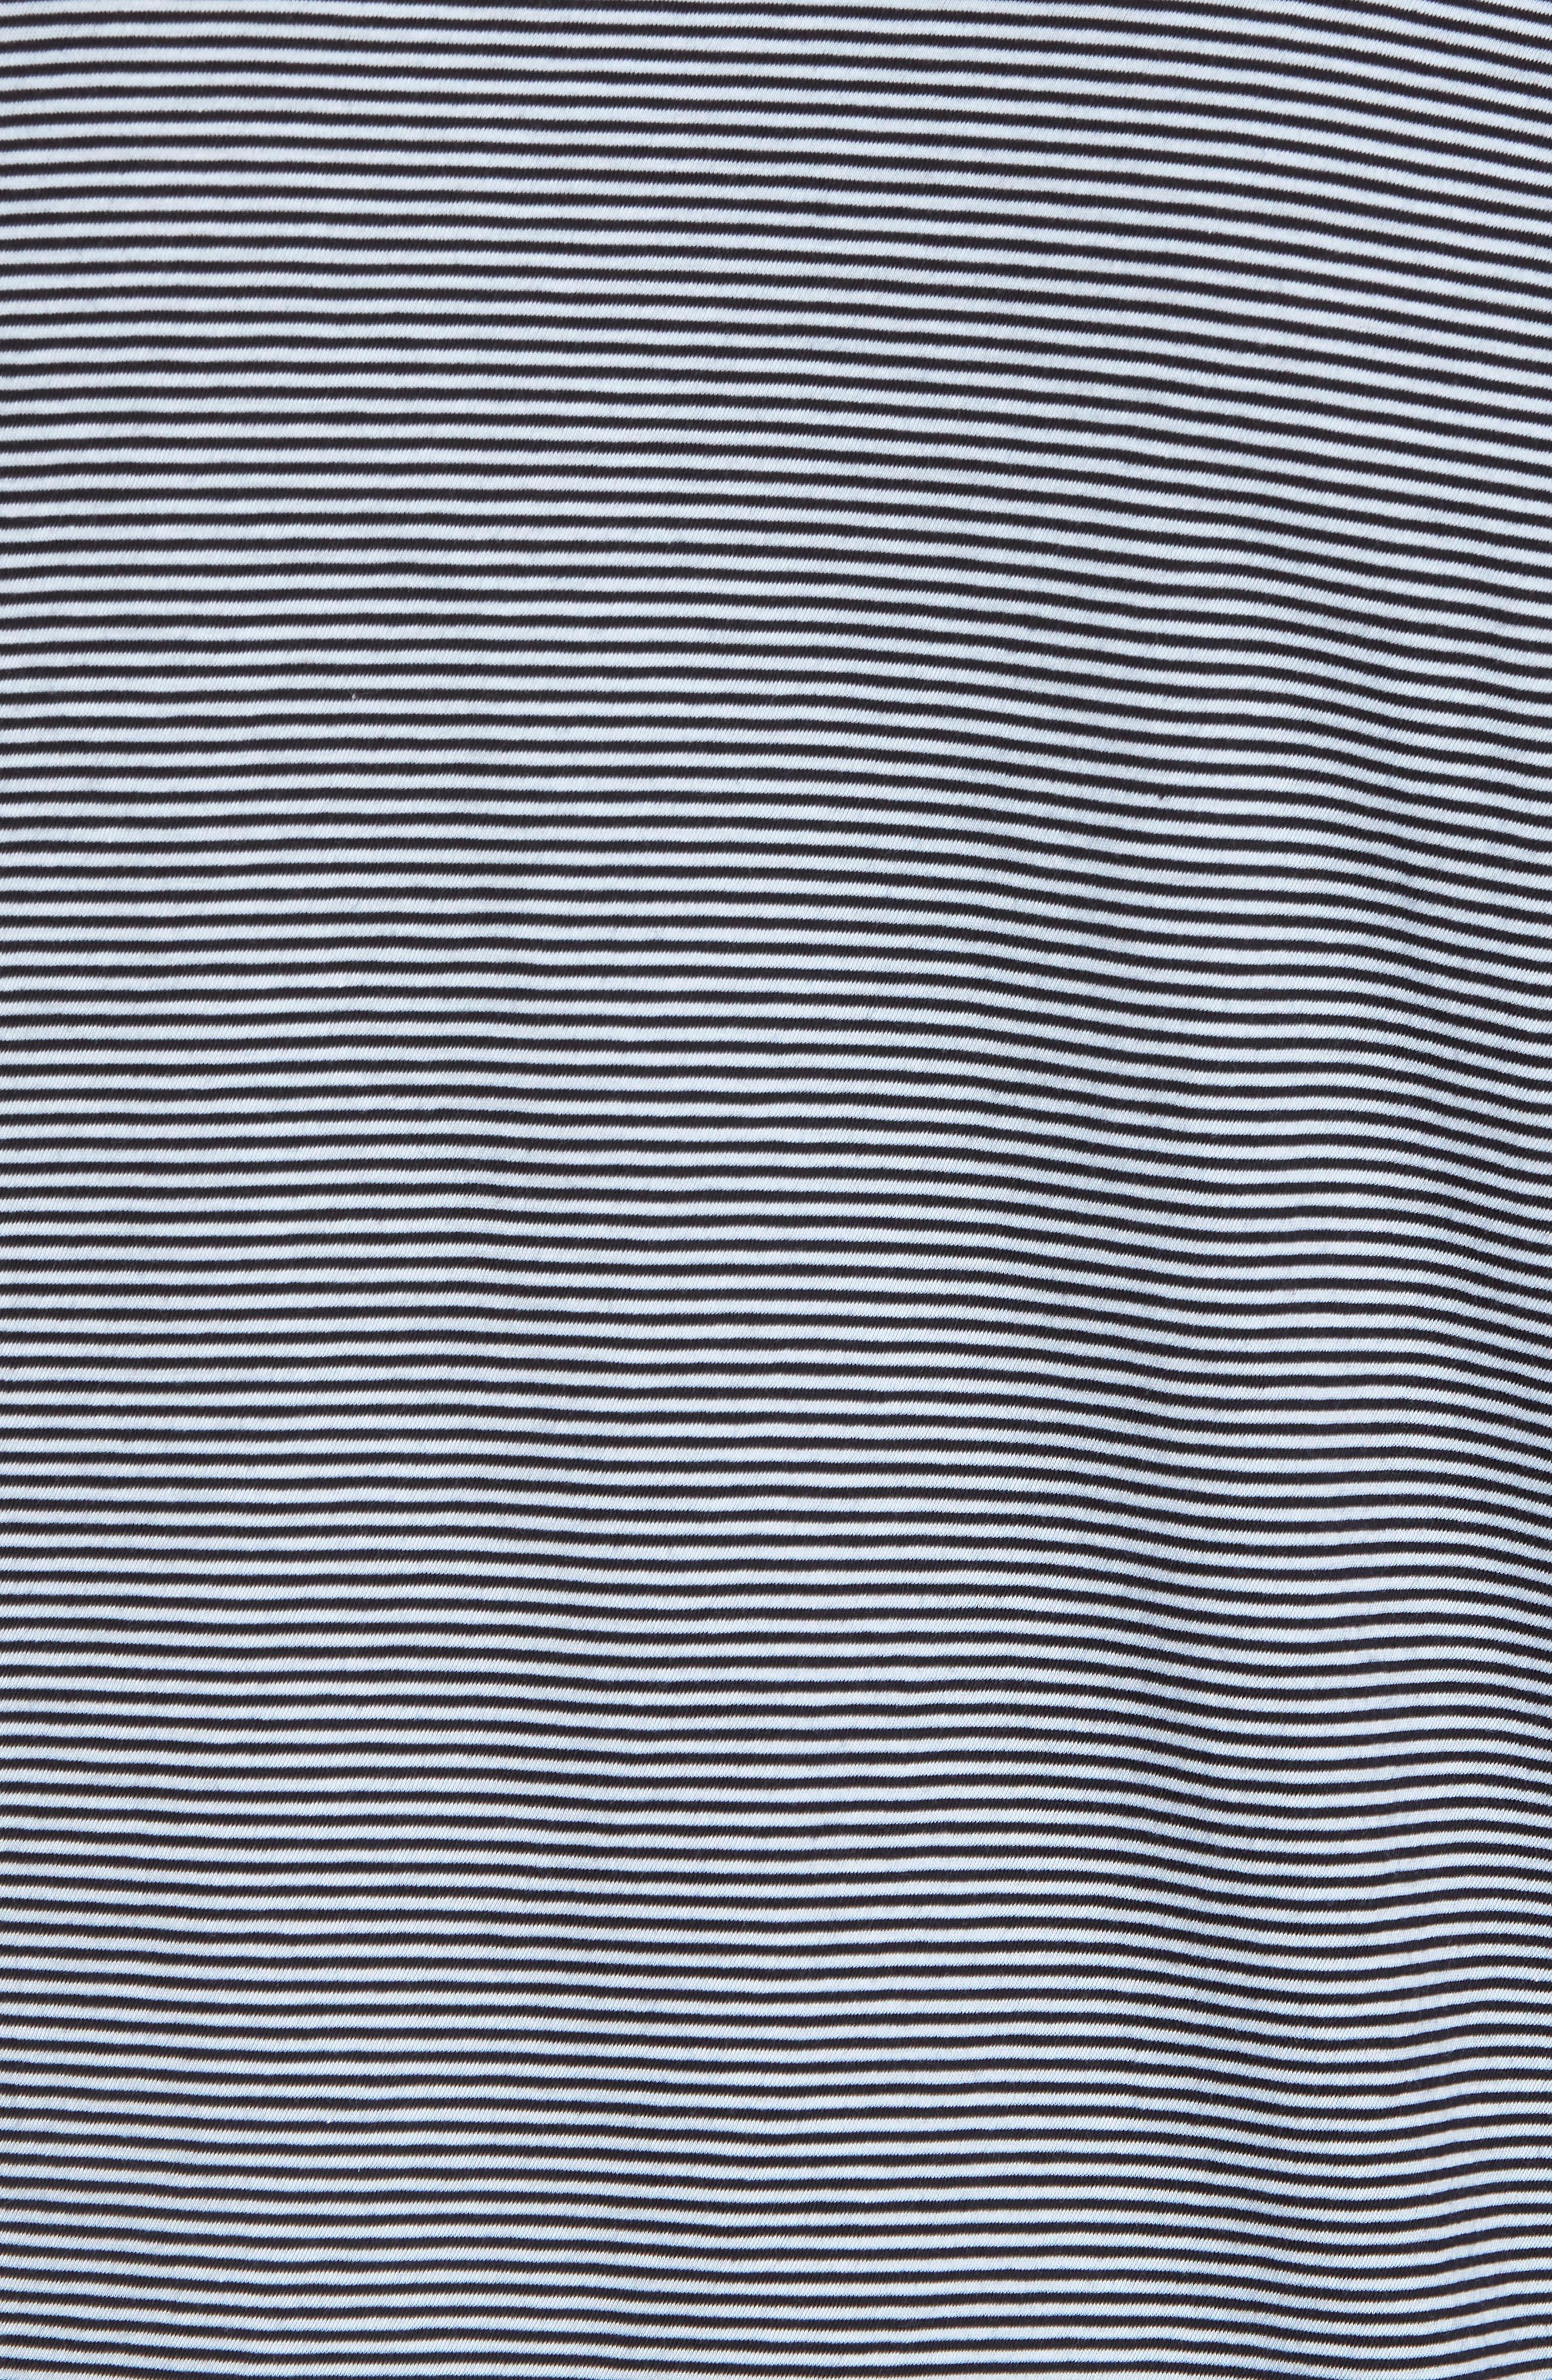 Slim Fit Stripe Pocket T-Shirt,                             Alternate thumbnail 20, color,